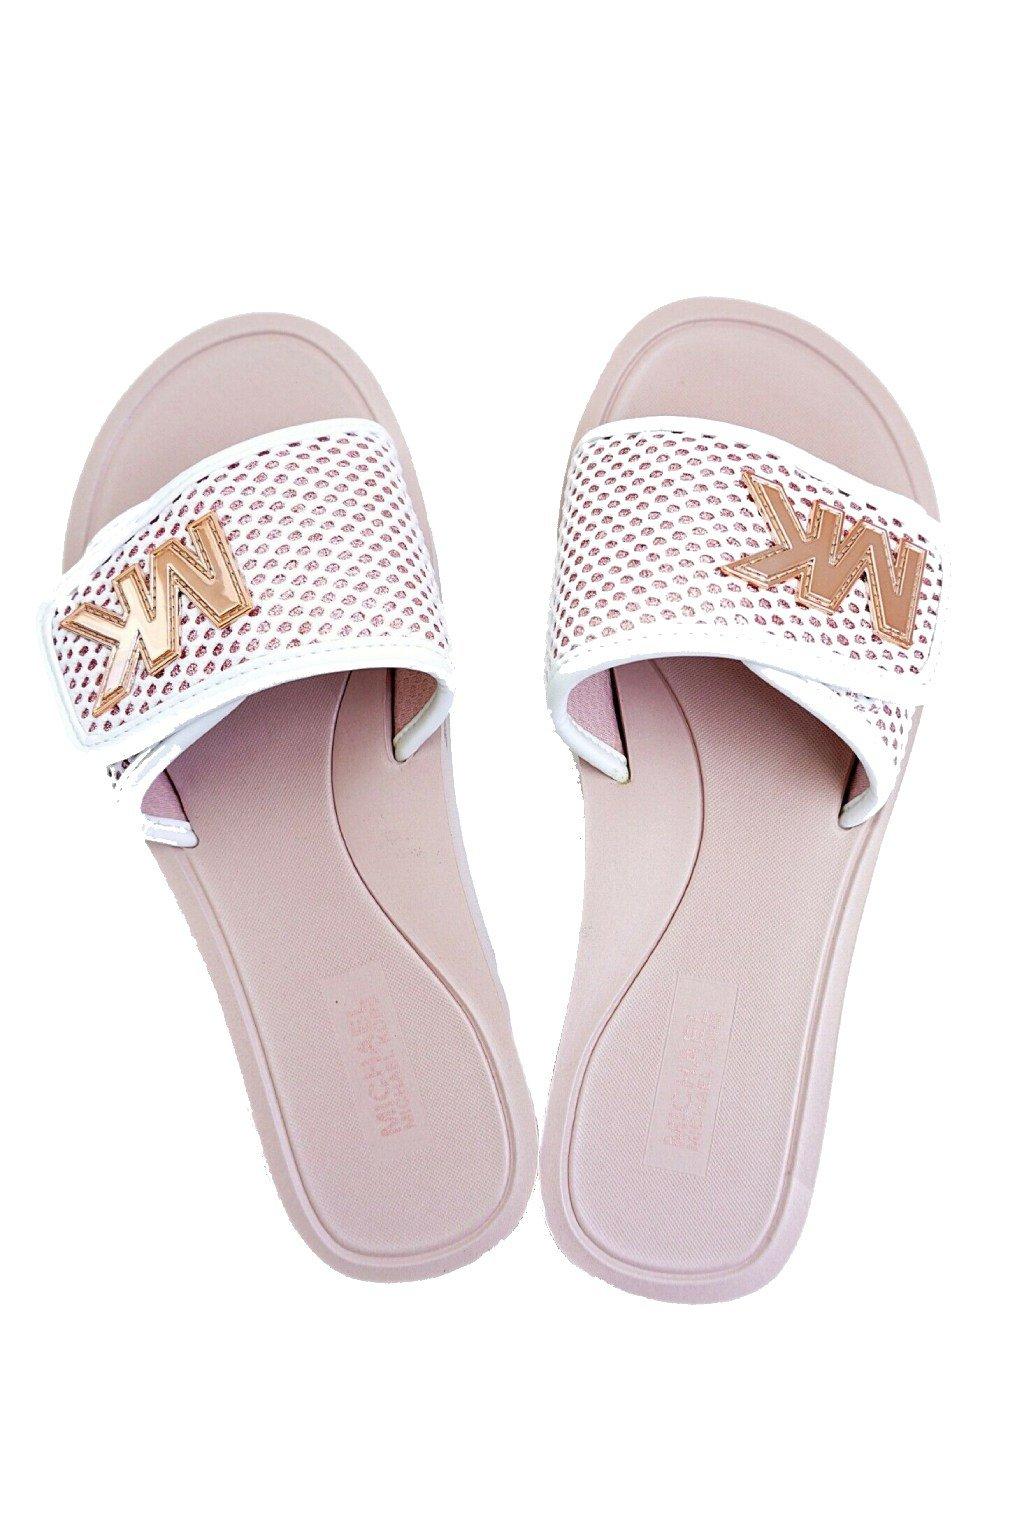 Damske ruzove pantofle Michael Kors zabky MK Calvin Klein pantofle Hermes Pantofle MK nazouvaky zeny znackove nazouvaky pantofle CK Replay zabky PAntofle zeny Michael KOrs pantofle originalni zlate nazouvaky (2)